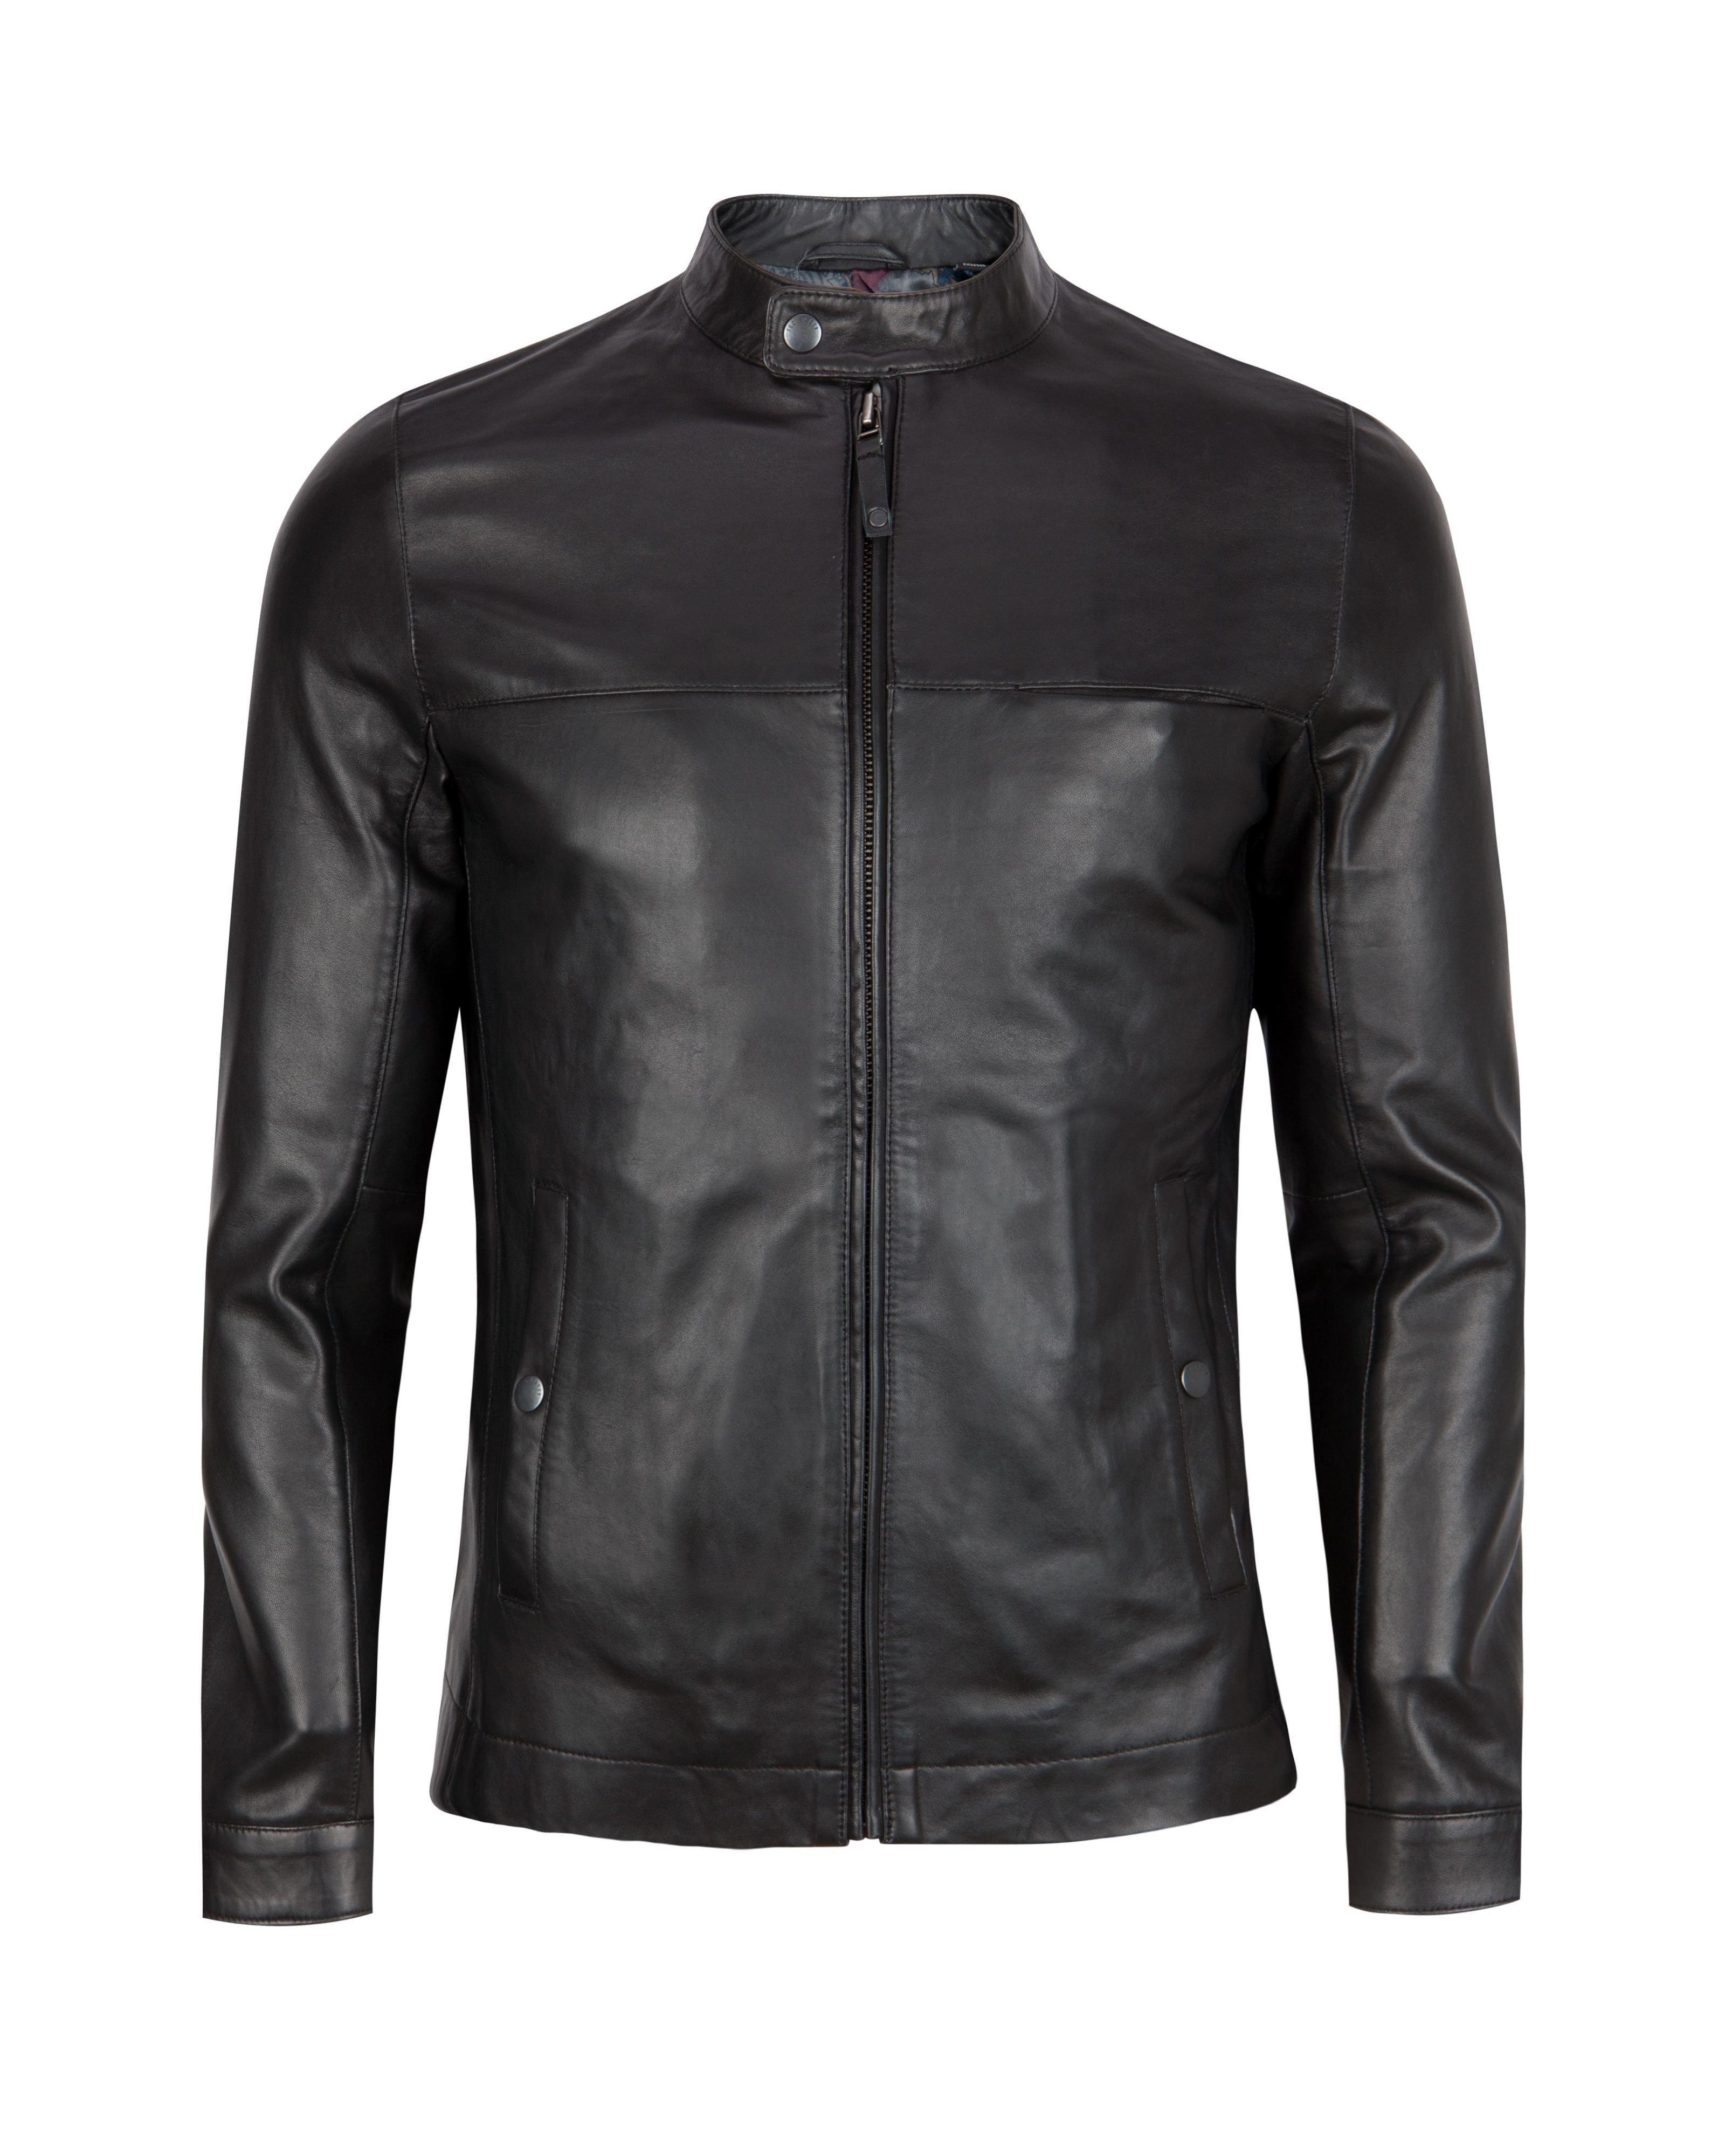 Ted baker mens leather jacket